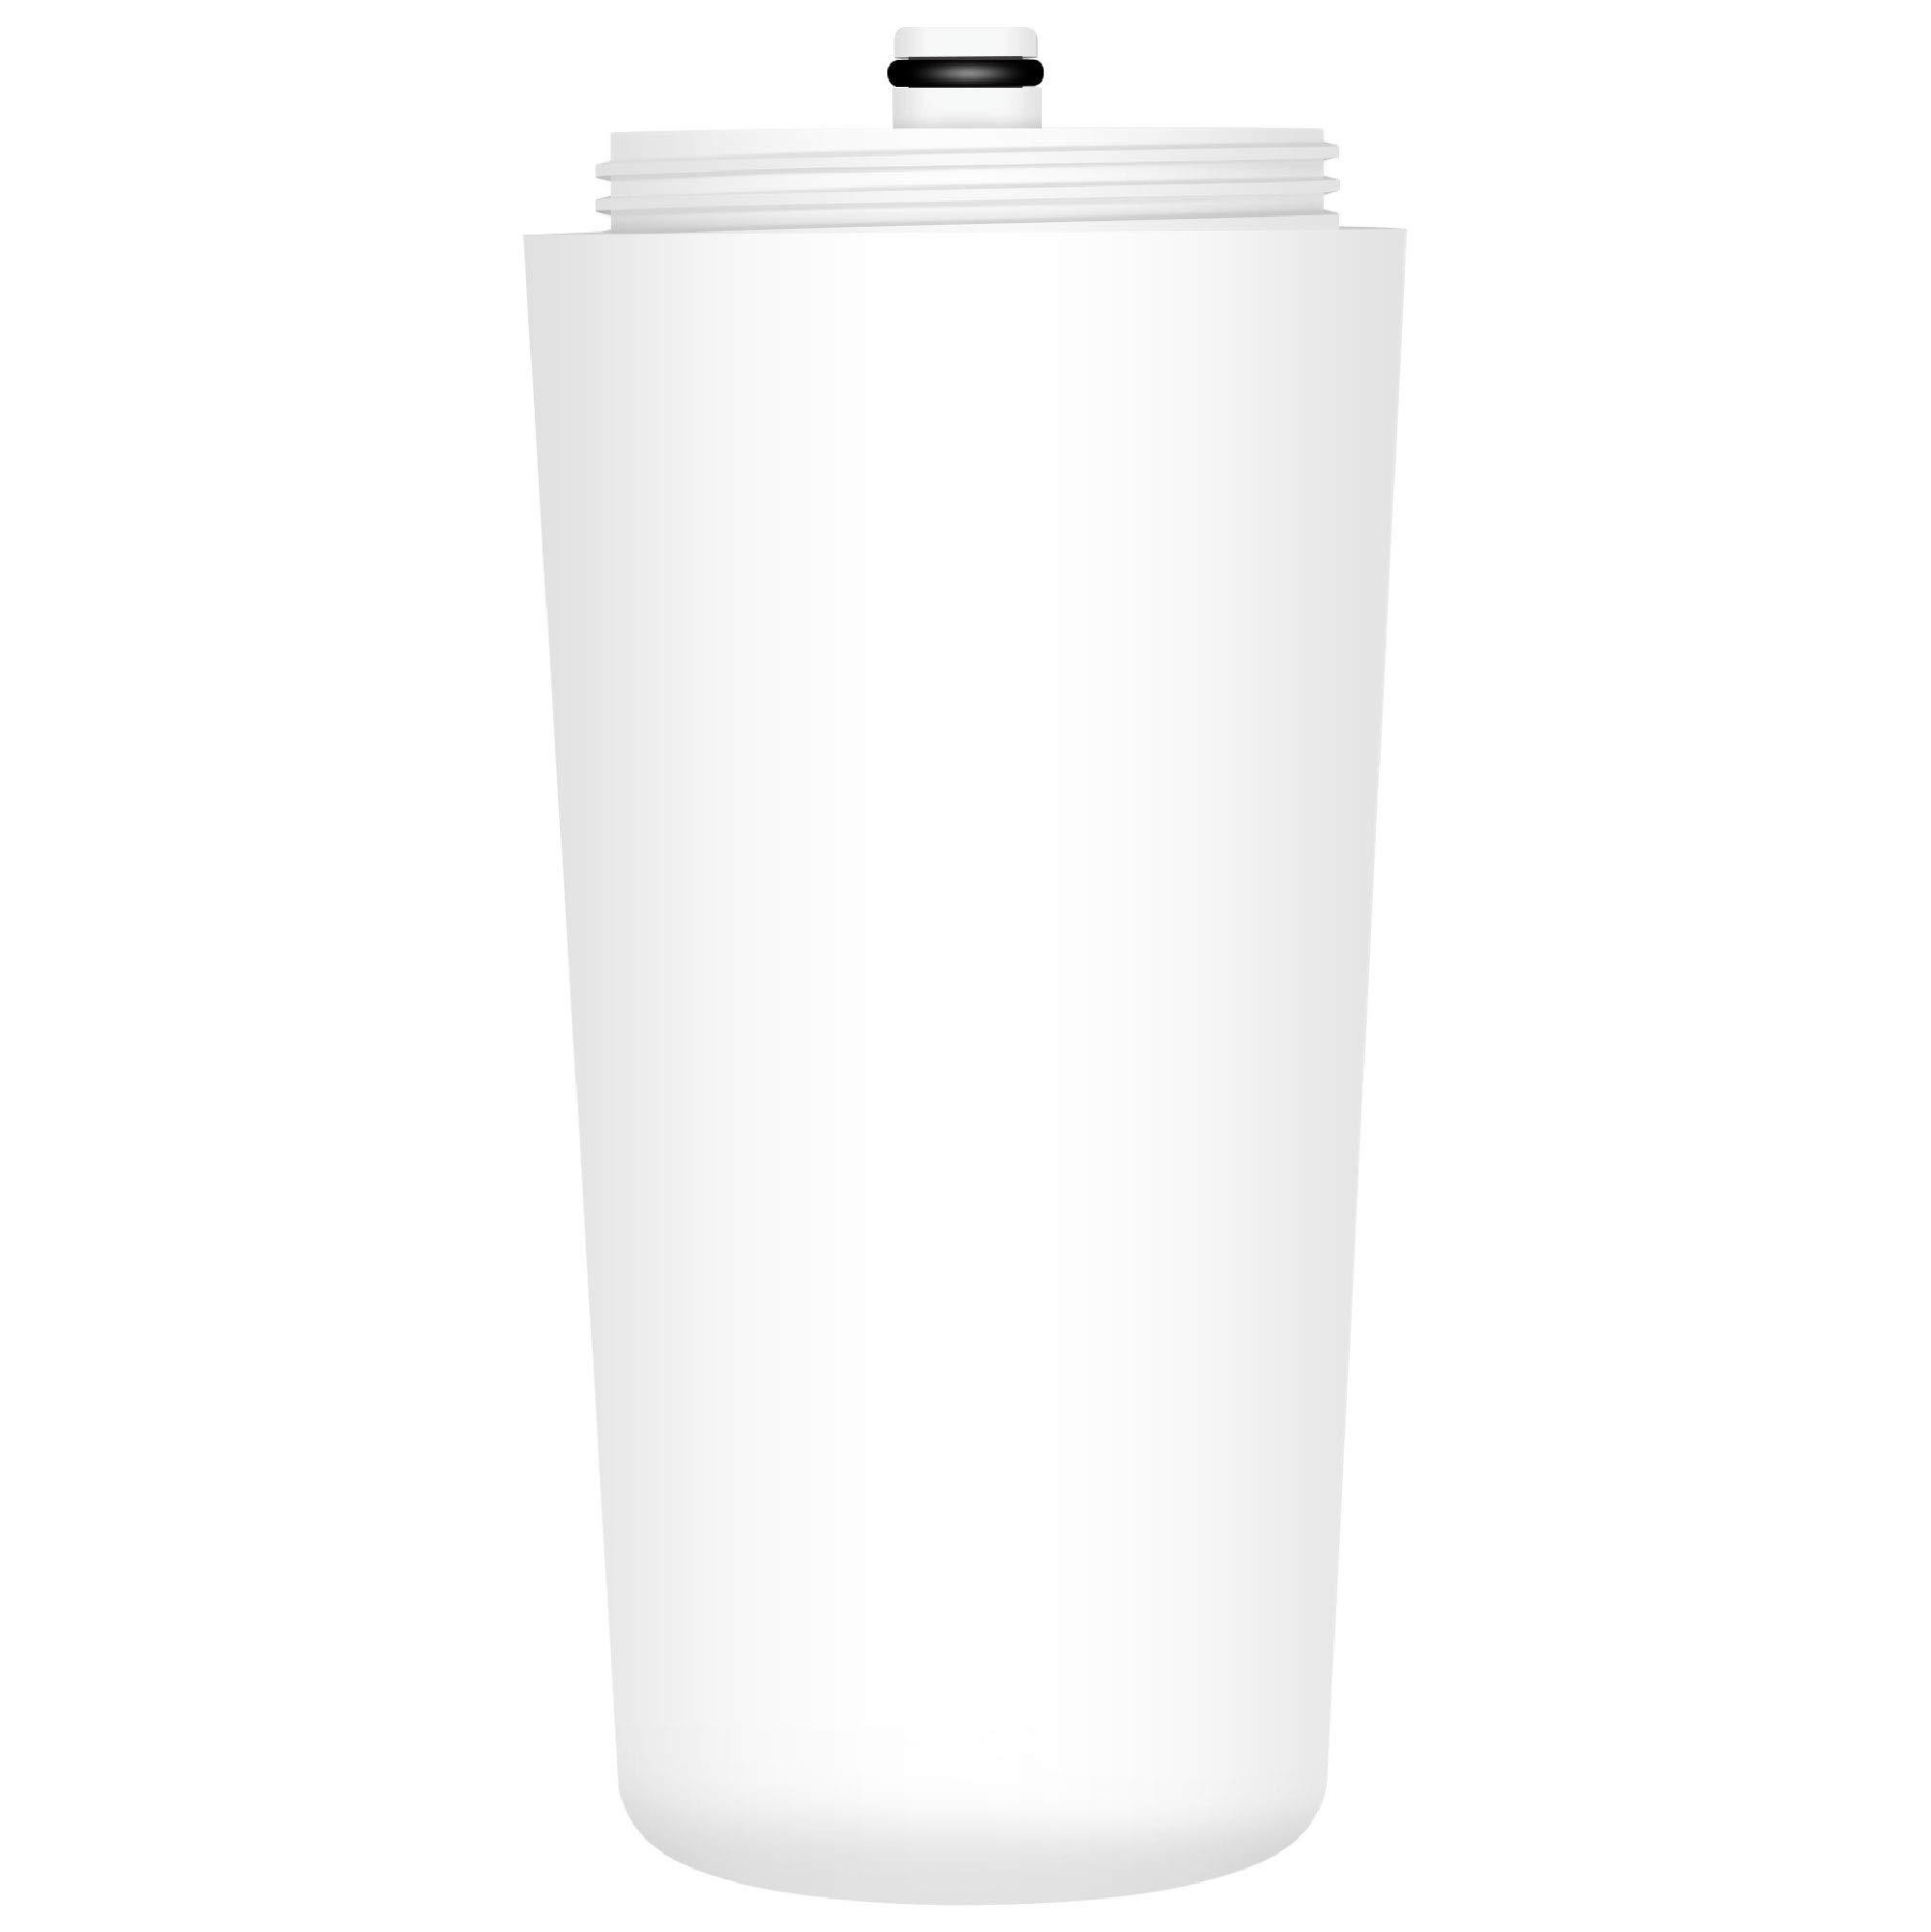 AQUACREST AQ 4125 Shower Water Filter, Compatible with Aquasana AQ 4125, AQ-4100, AQ-4100NSH, AQ-4105, Jonathan Product Beauty Shower Filter, with Advanced KDF Filtration Material by AQUA CREST